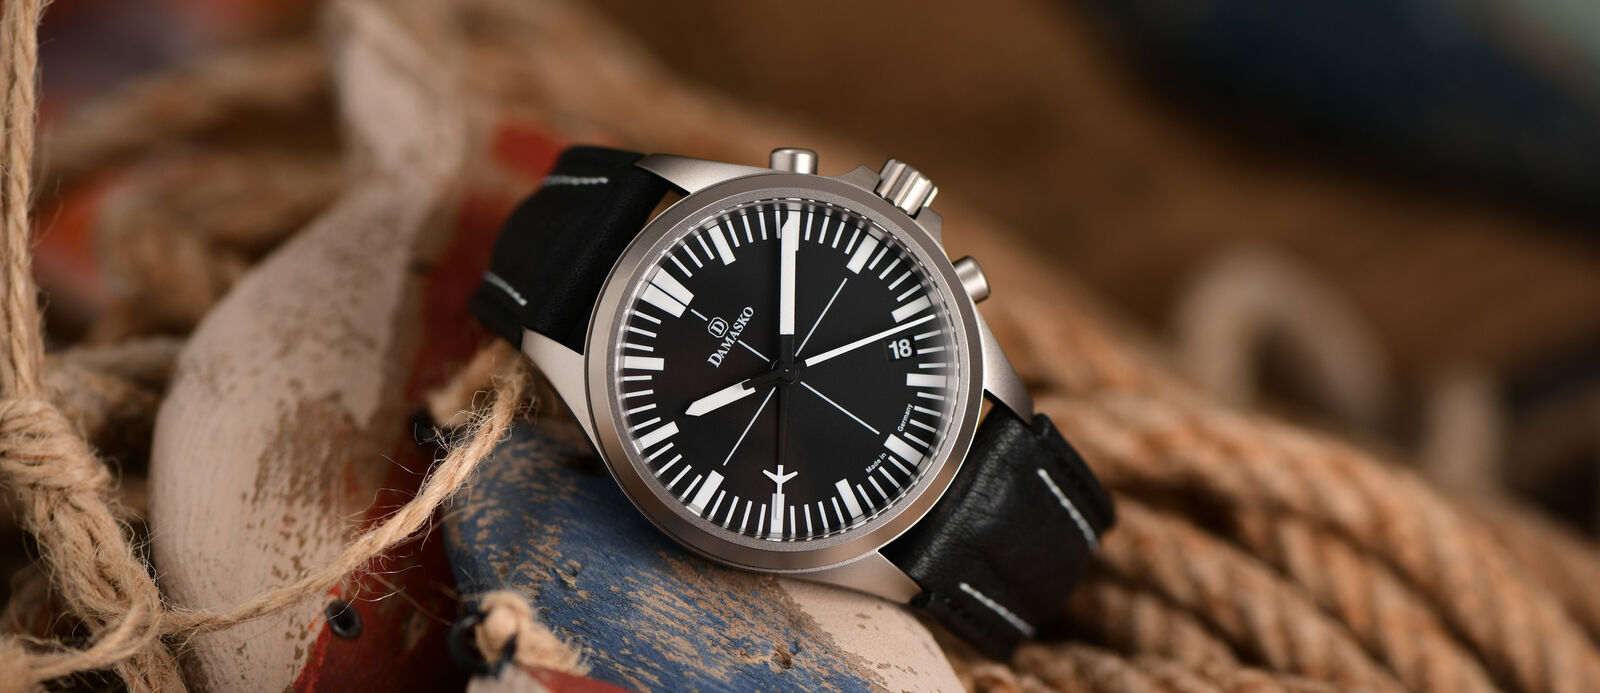 Damasko Chronograph DC7X Pilot Watches